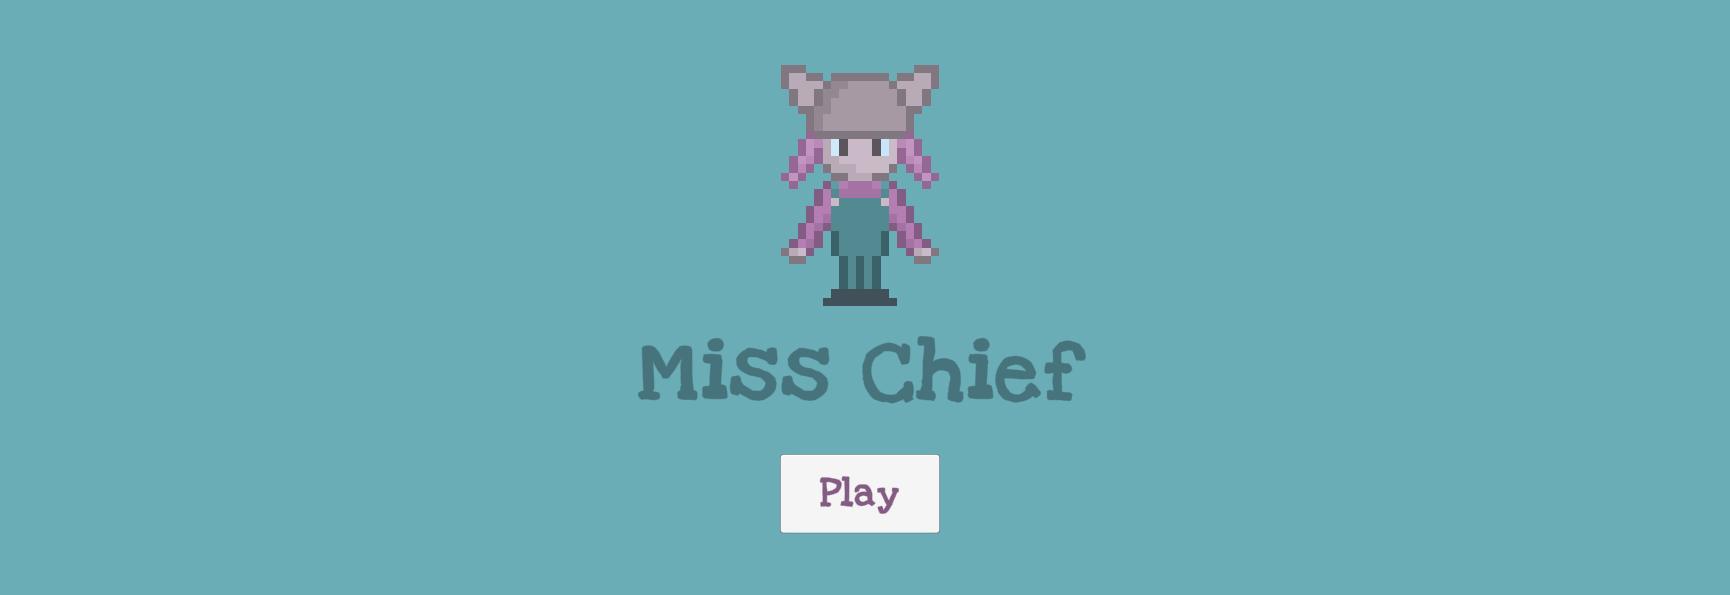 Miss Chief